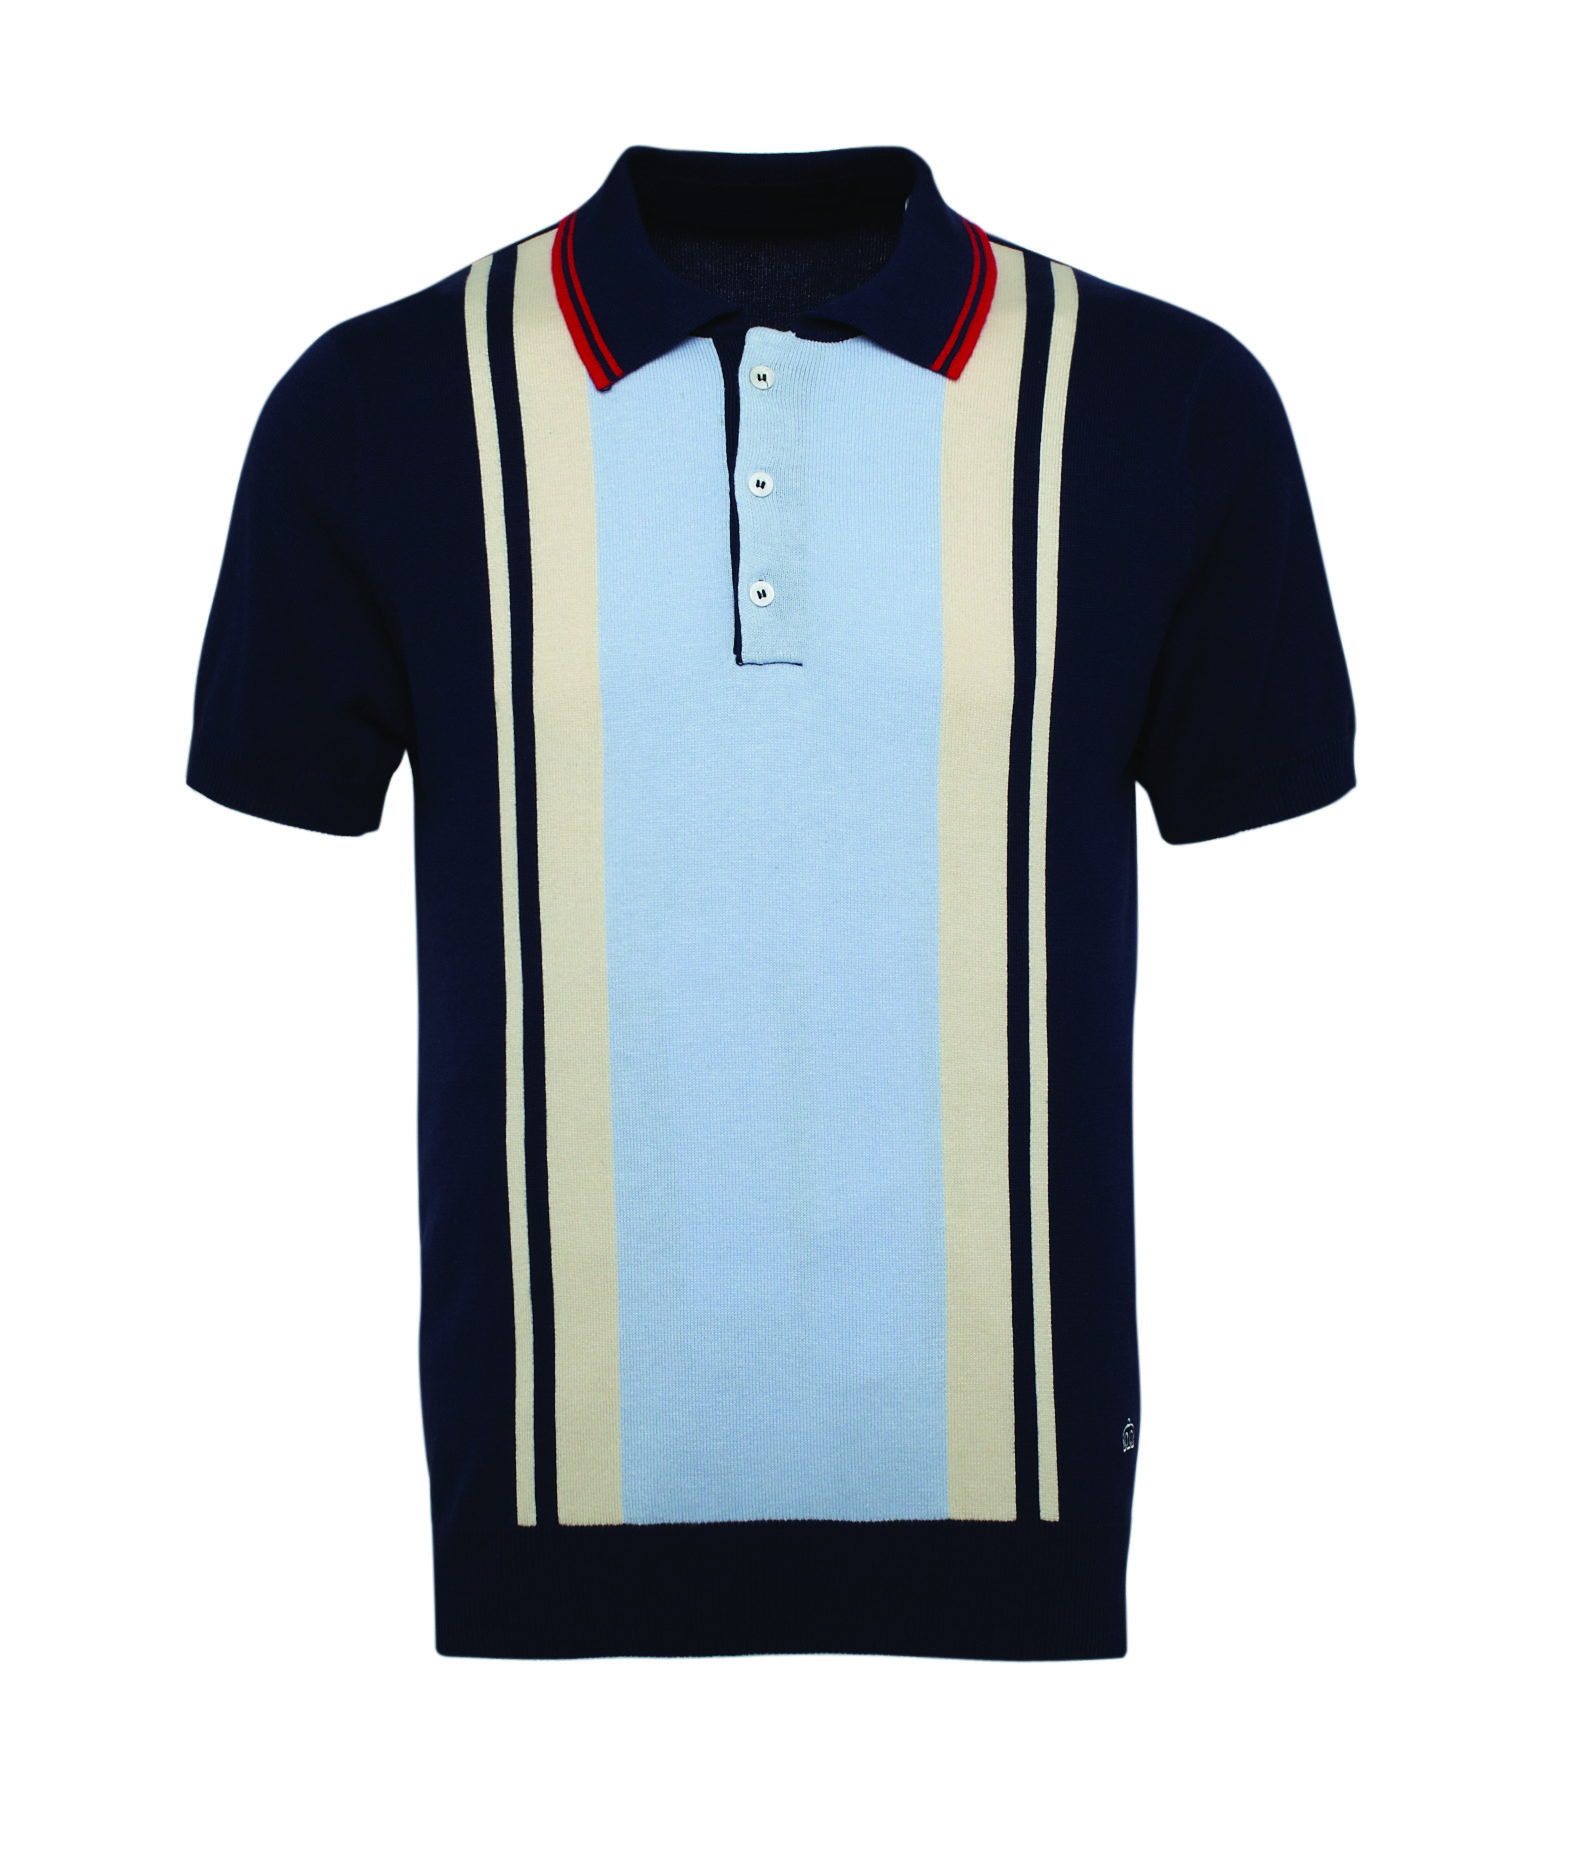 Merc Men's Bramham Knitted Polo | Polo shirt style